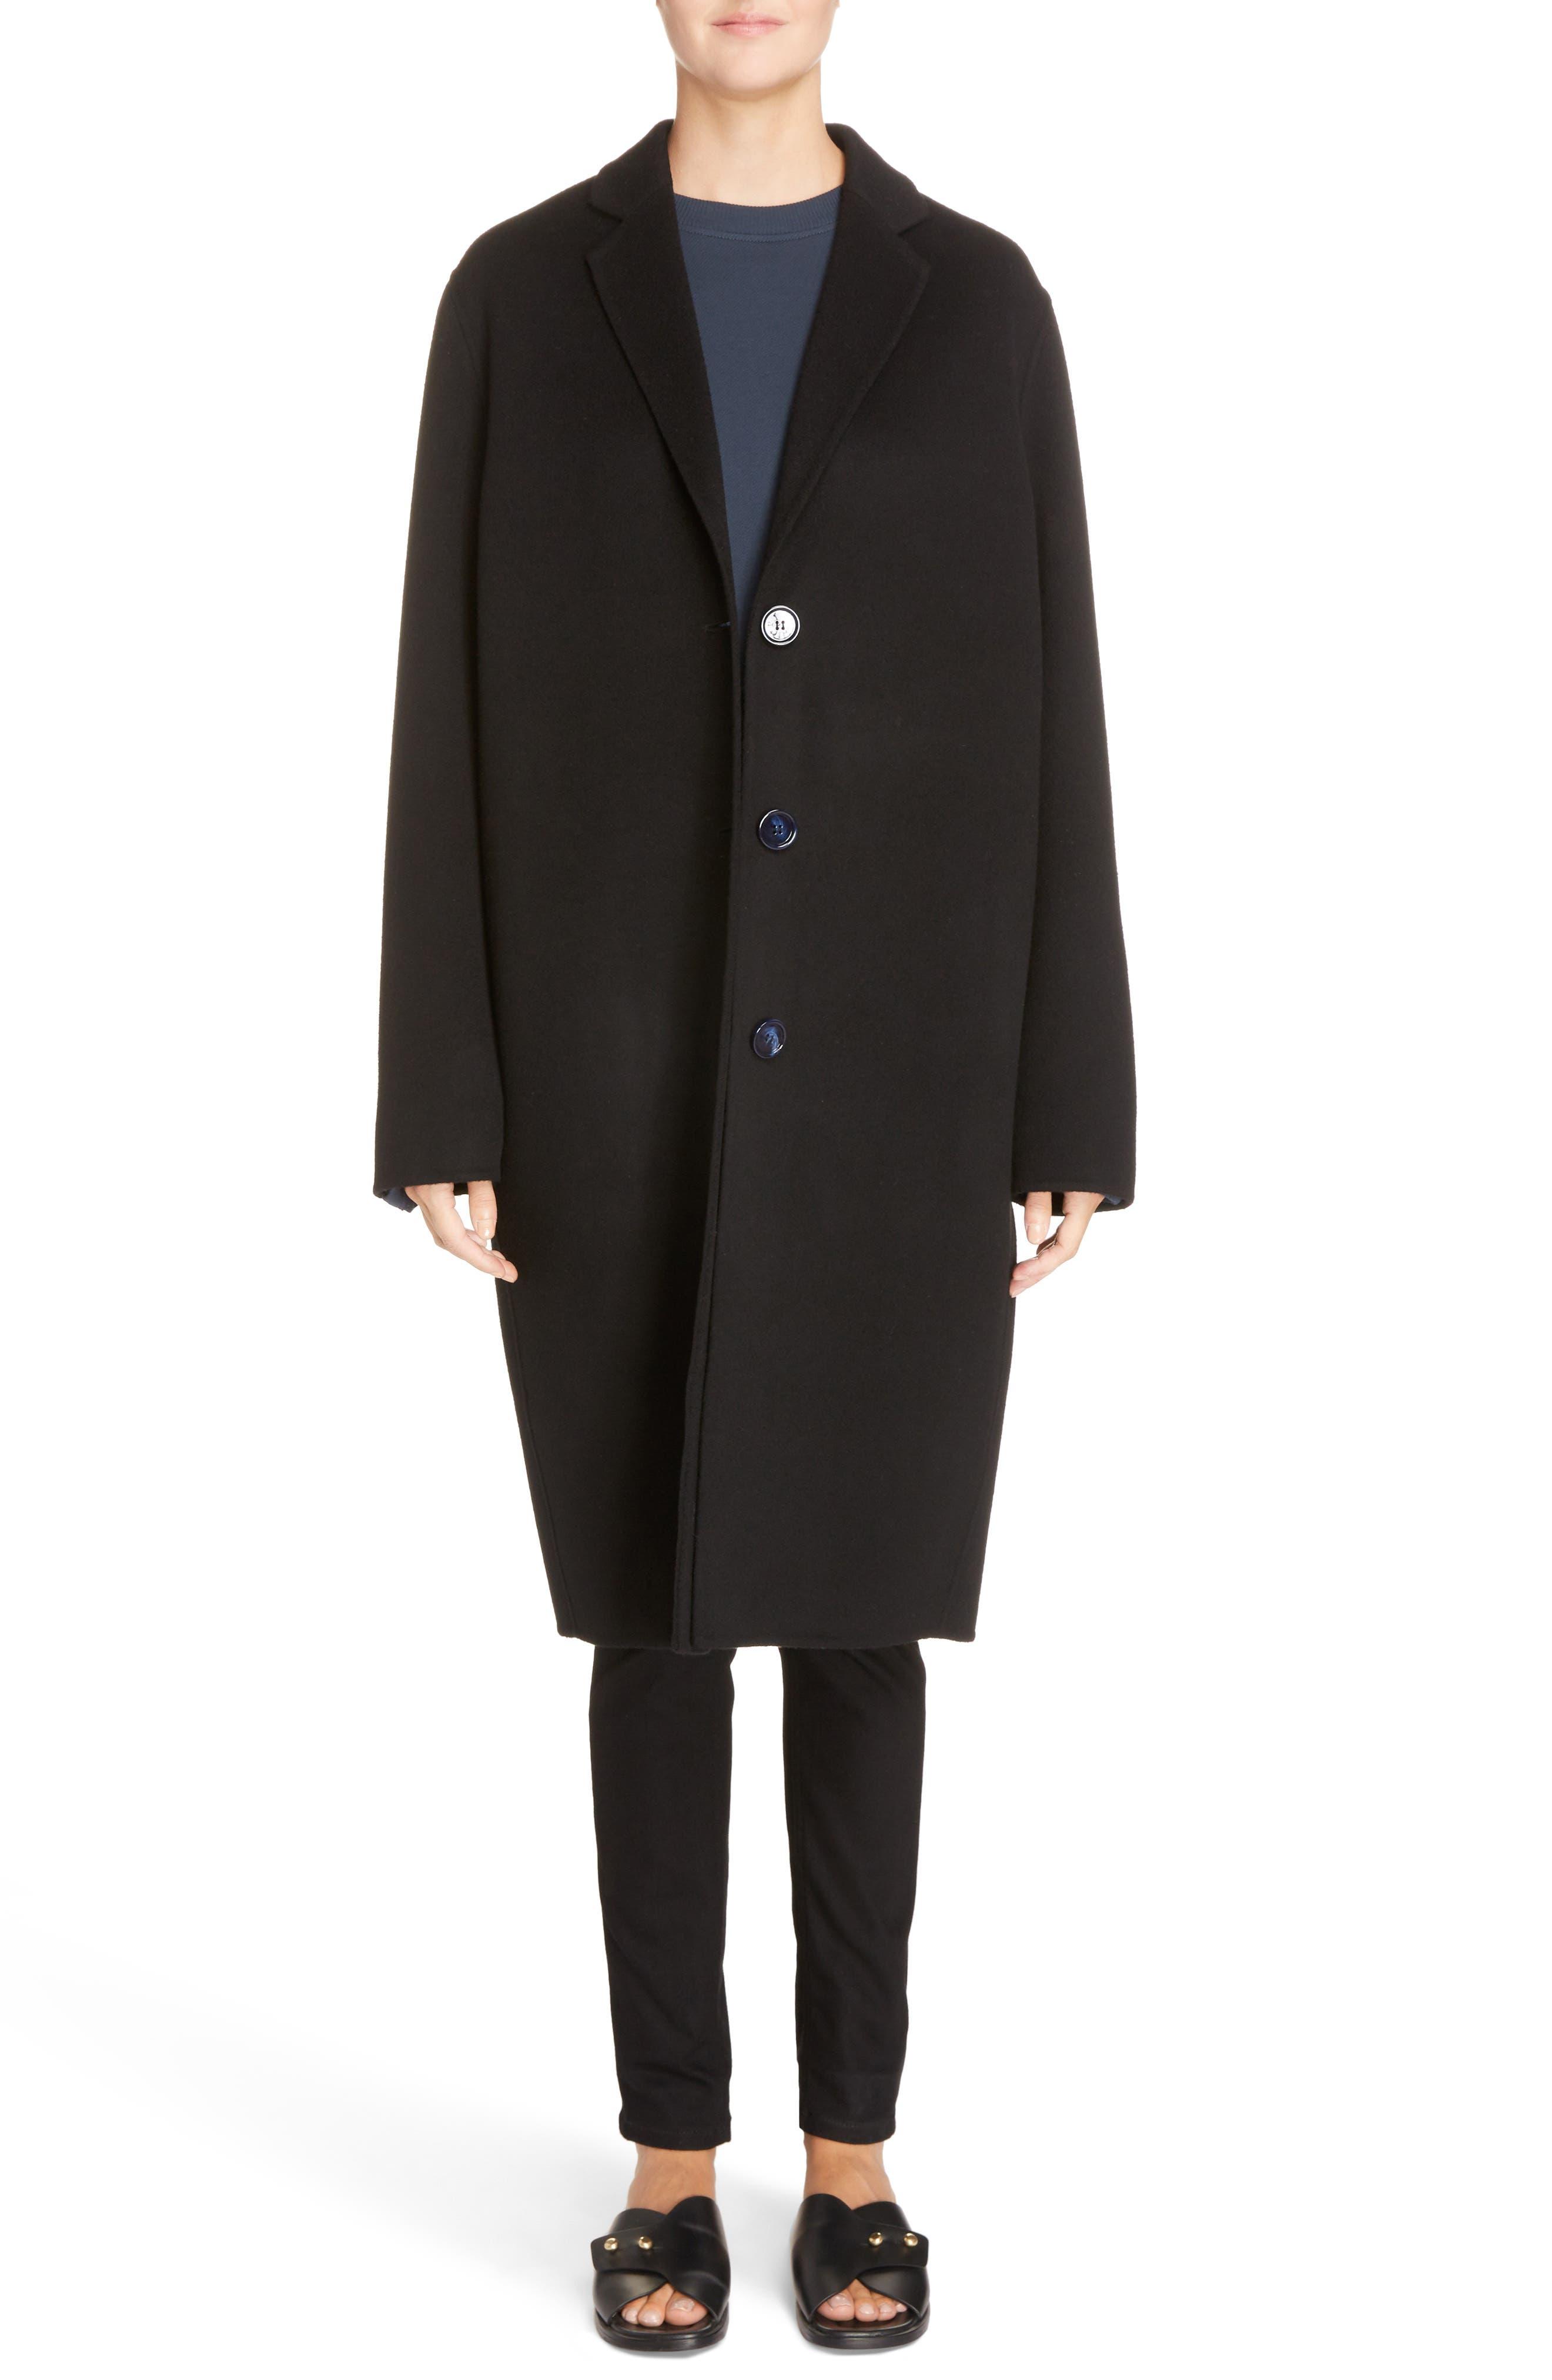 Avalon Wool & Cashmere Coat,                             Alternate thumbnail 6, color,                             Black